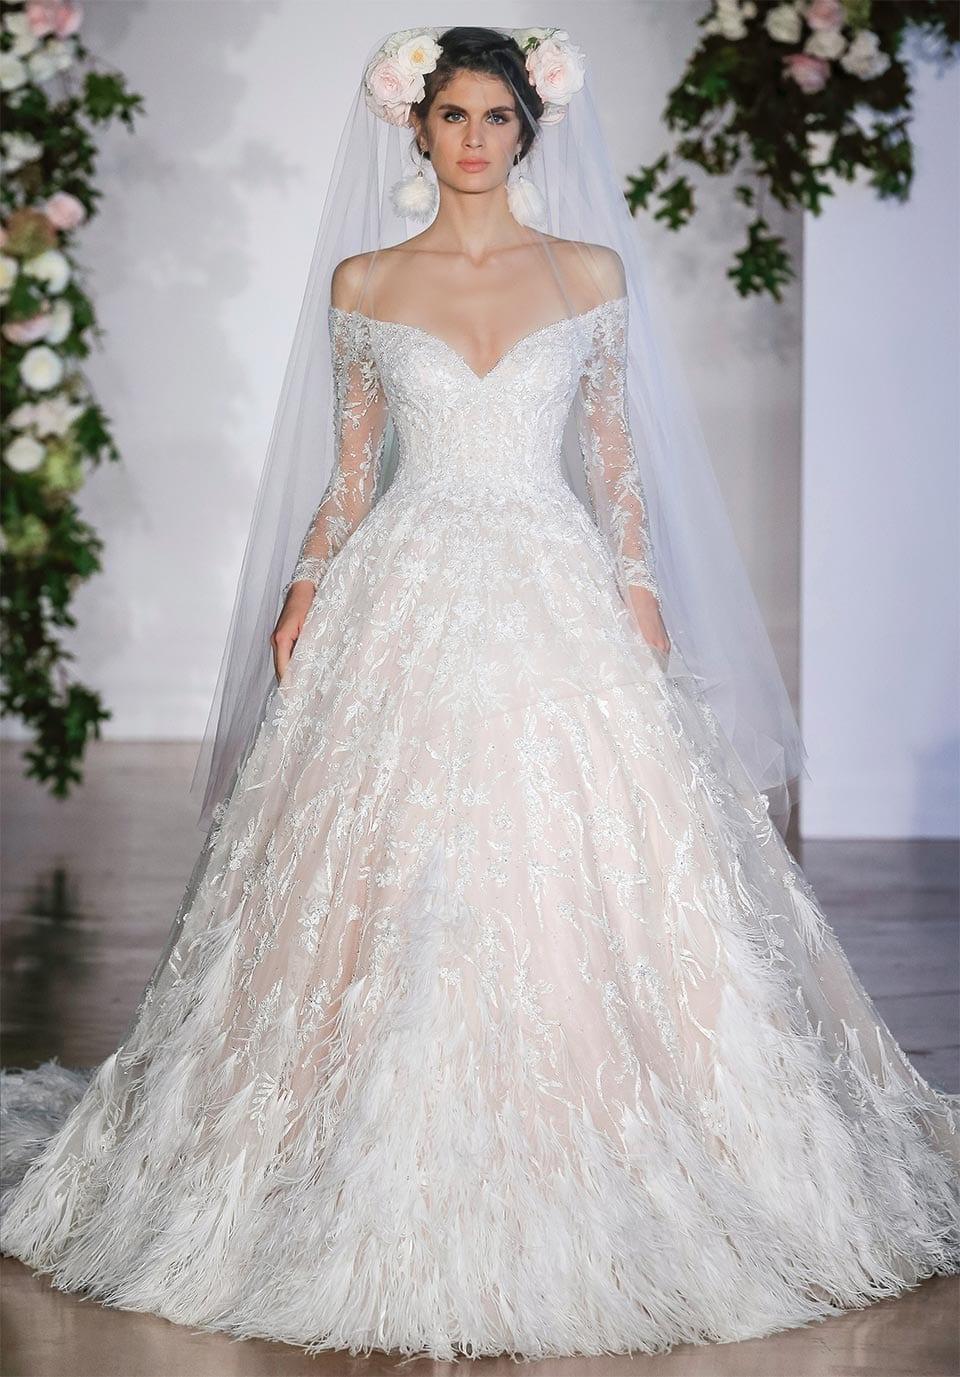 Wedding Dress Silhouette Style - Ballgown